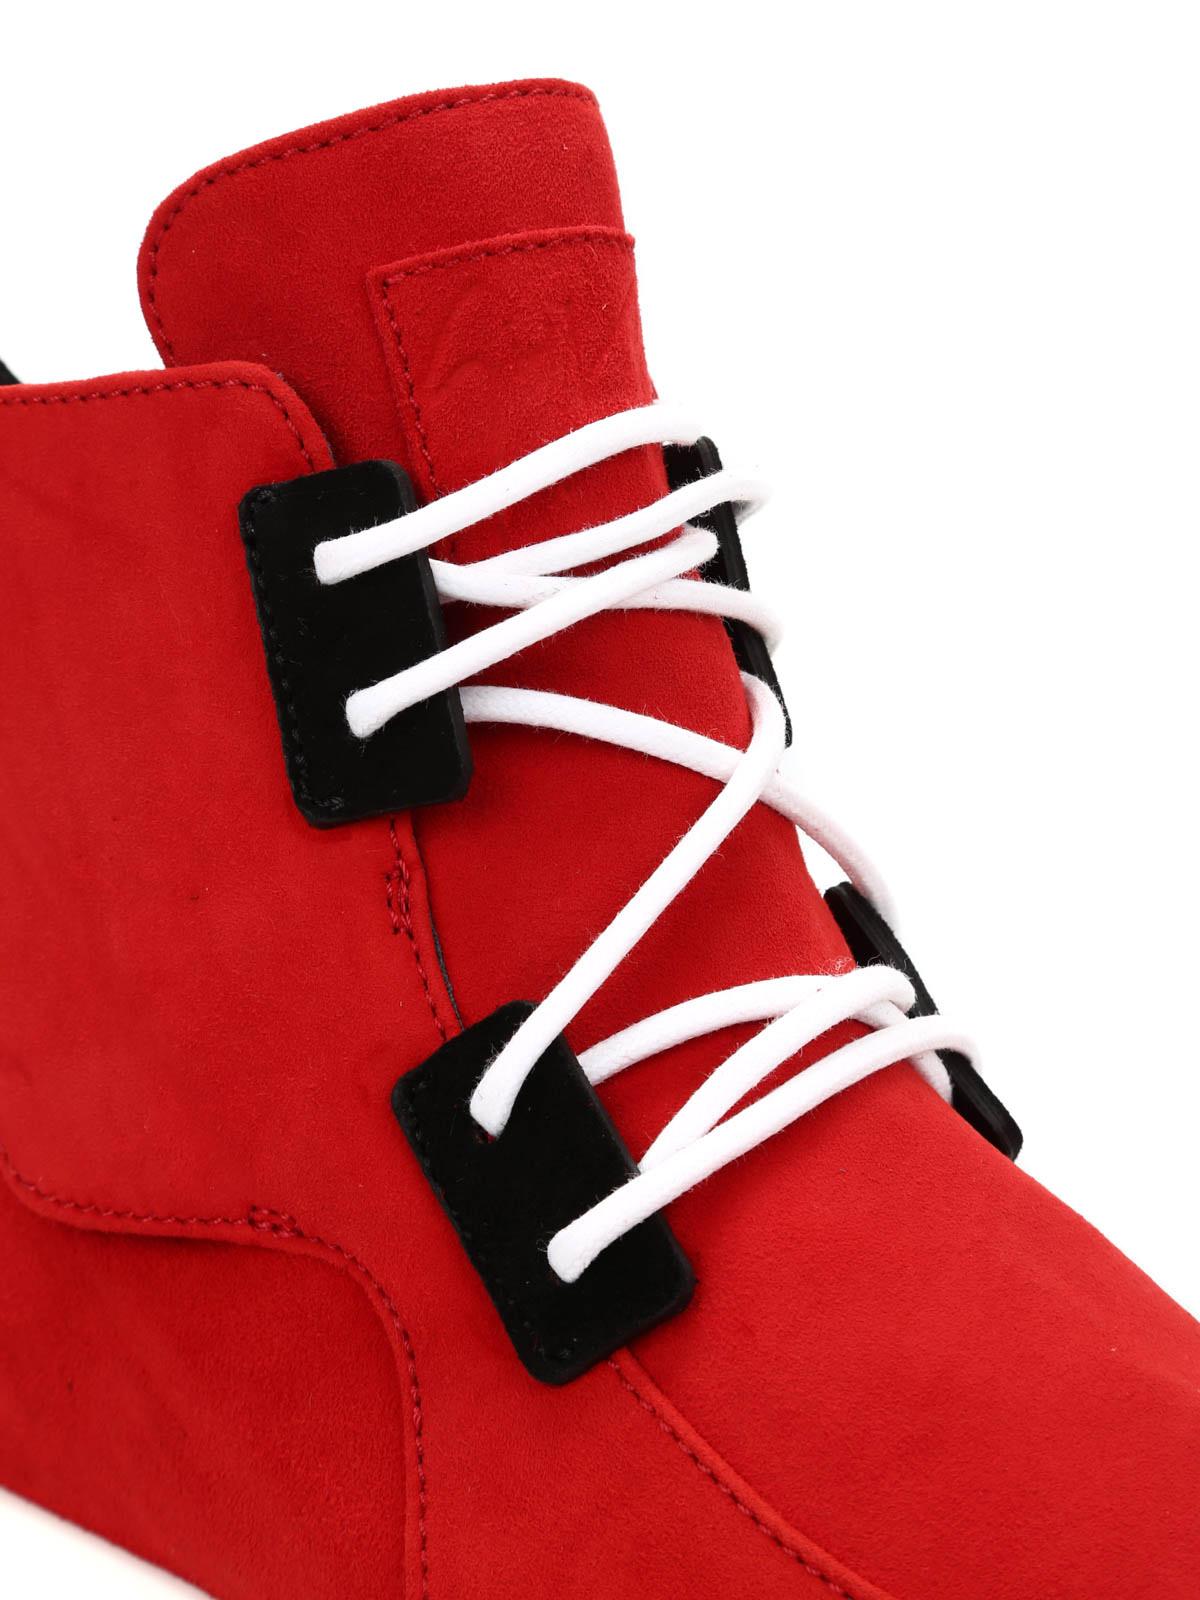 421a5fc12b9ac Giuseppe Zanotti - Shark 1.0 hi-top sneakers - trainers - RM6100002